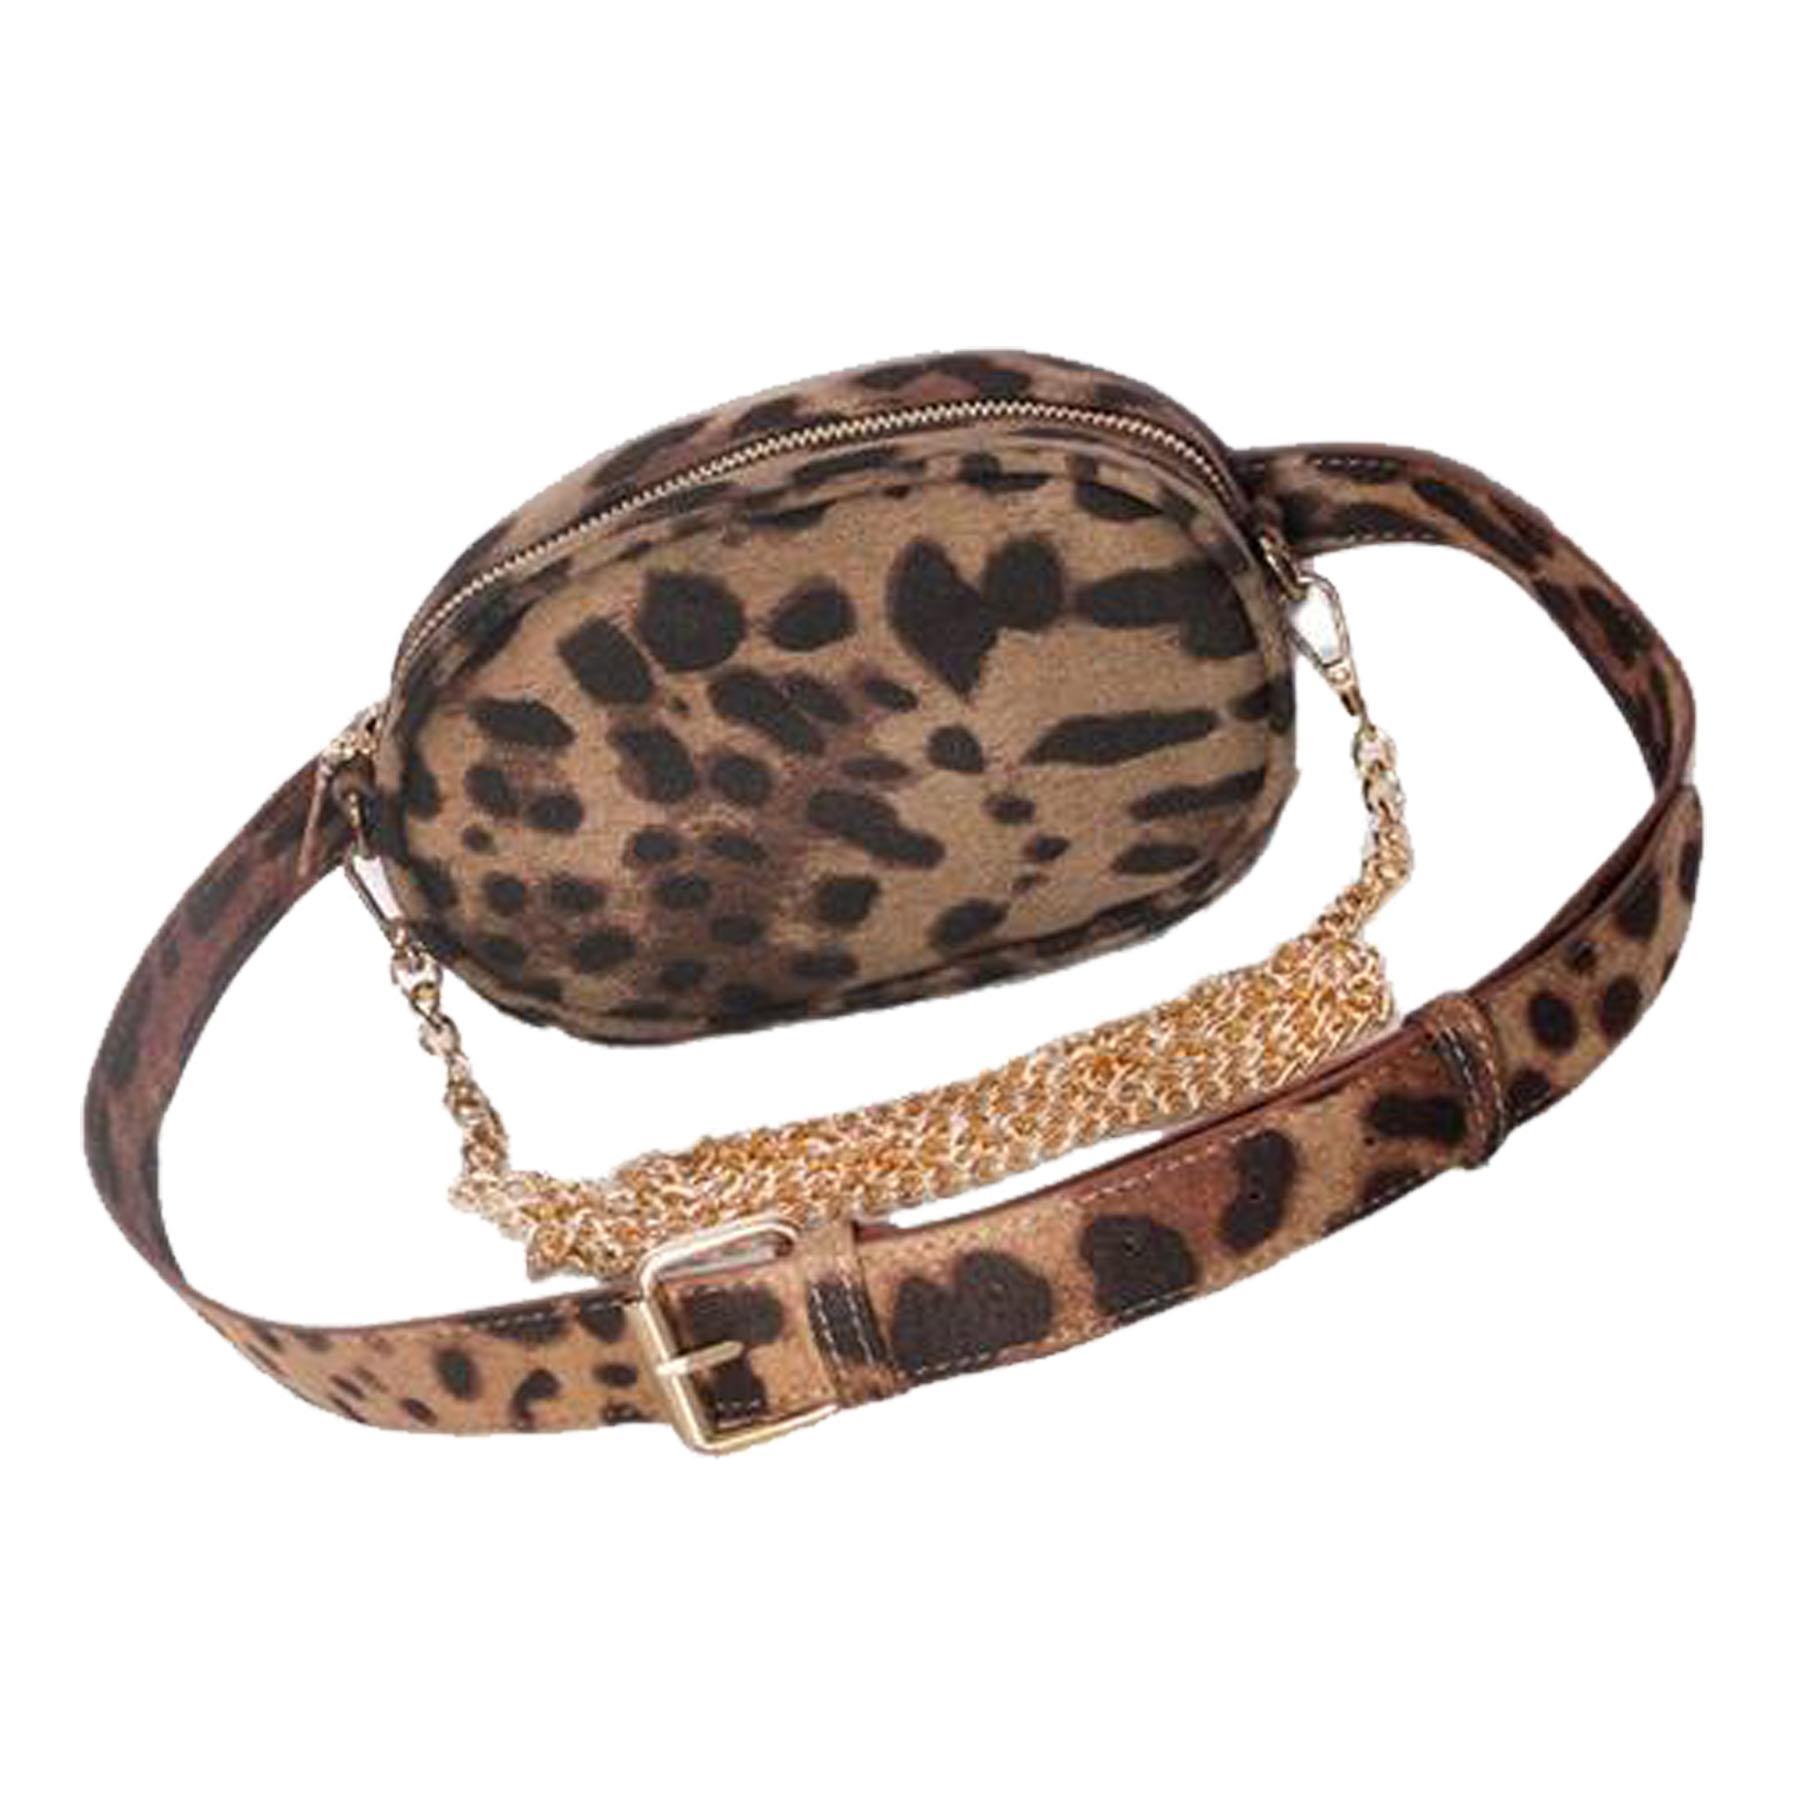 New-Synthetic-Leather-Animal-Leopard-Print-Ladies-Festival-Bum-Waist-Bag thumbnail 3